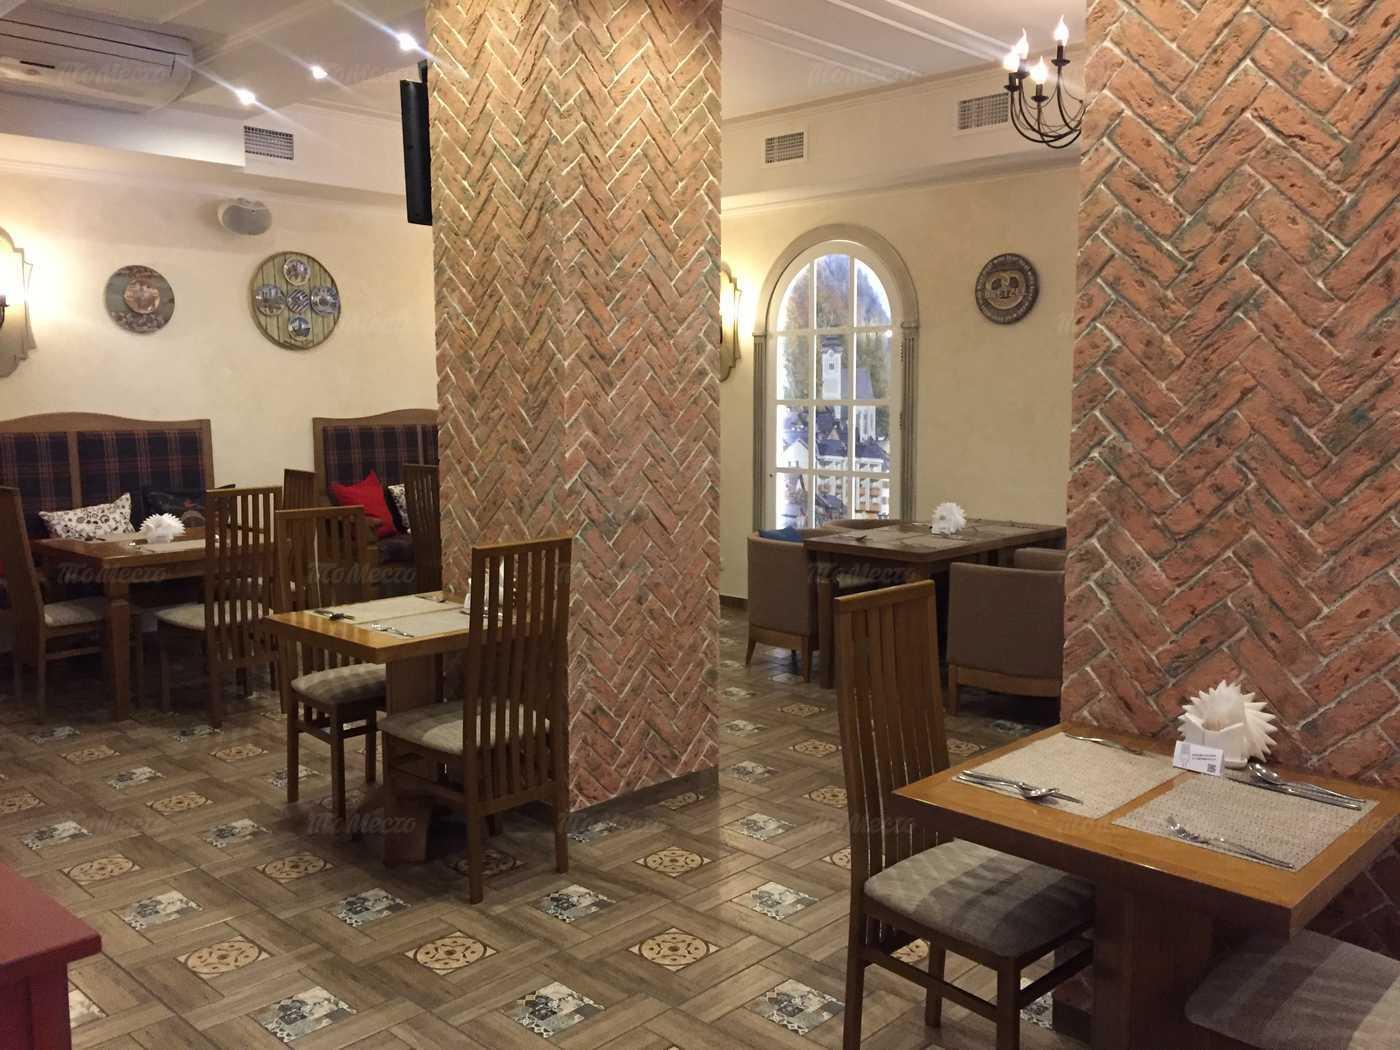 Ресторан Bretzel (Брецель) на улице Химиков фото 6